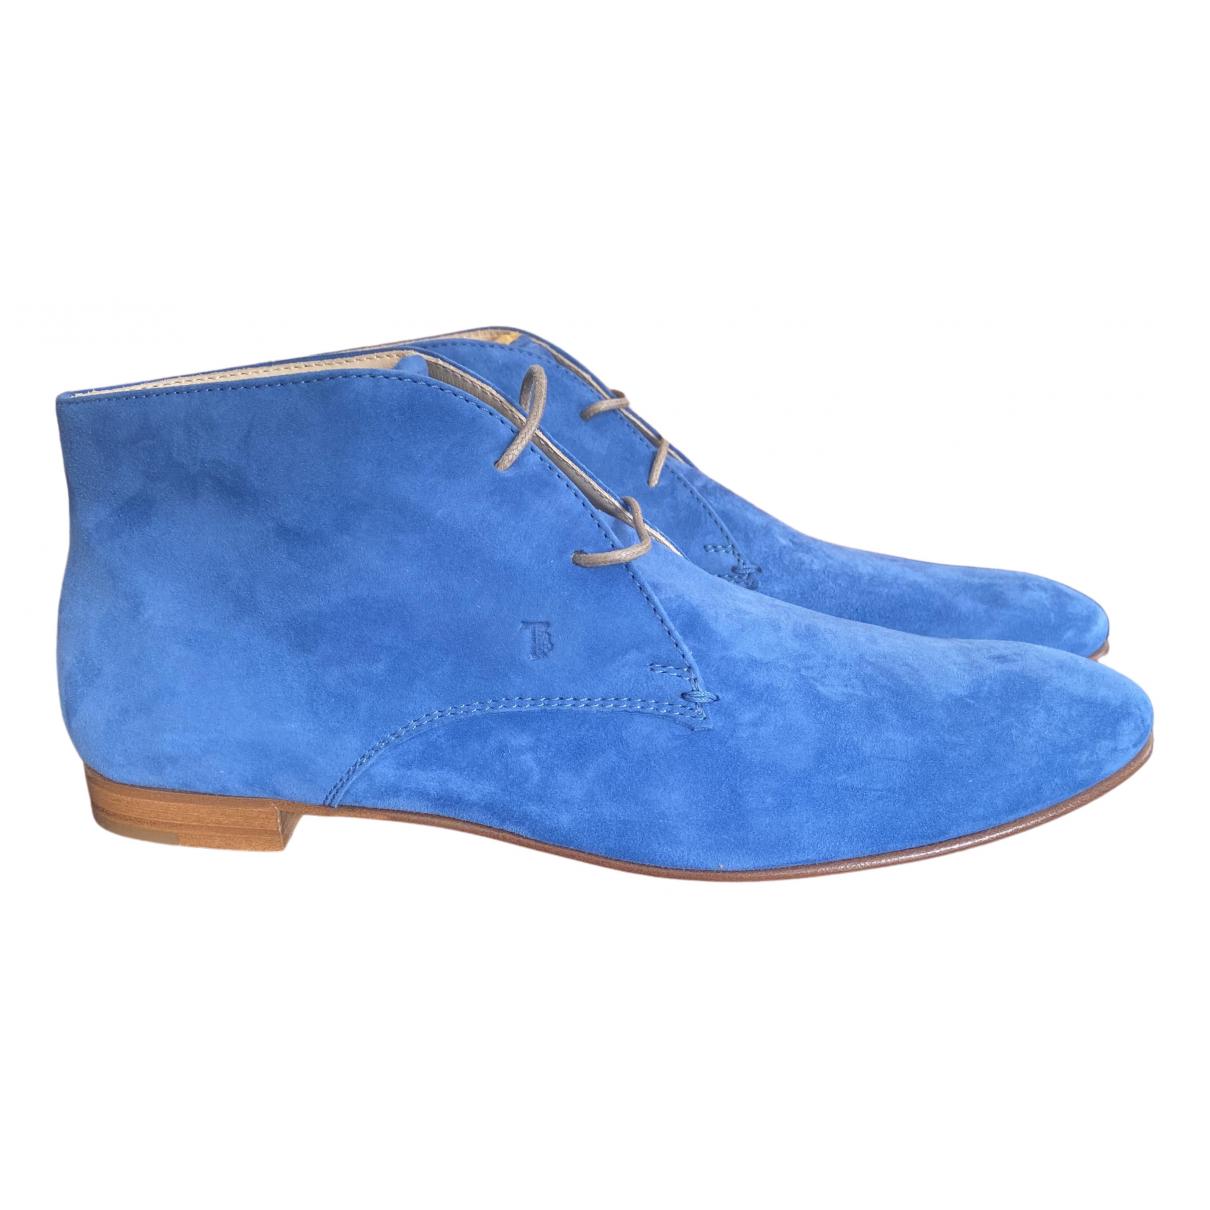 Tods \N Stiefeletten in  Blau Veloursleder